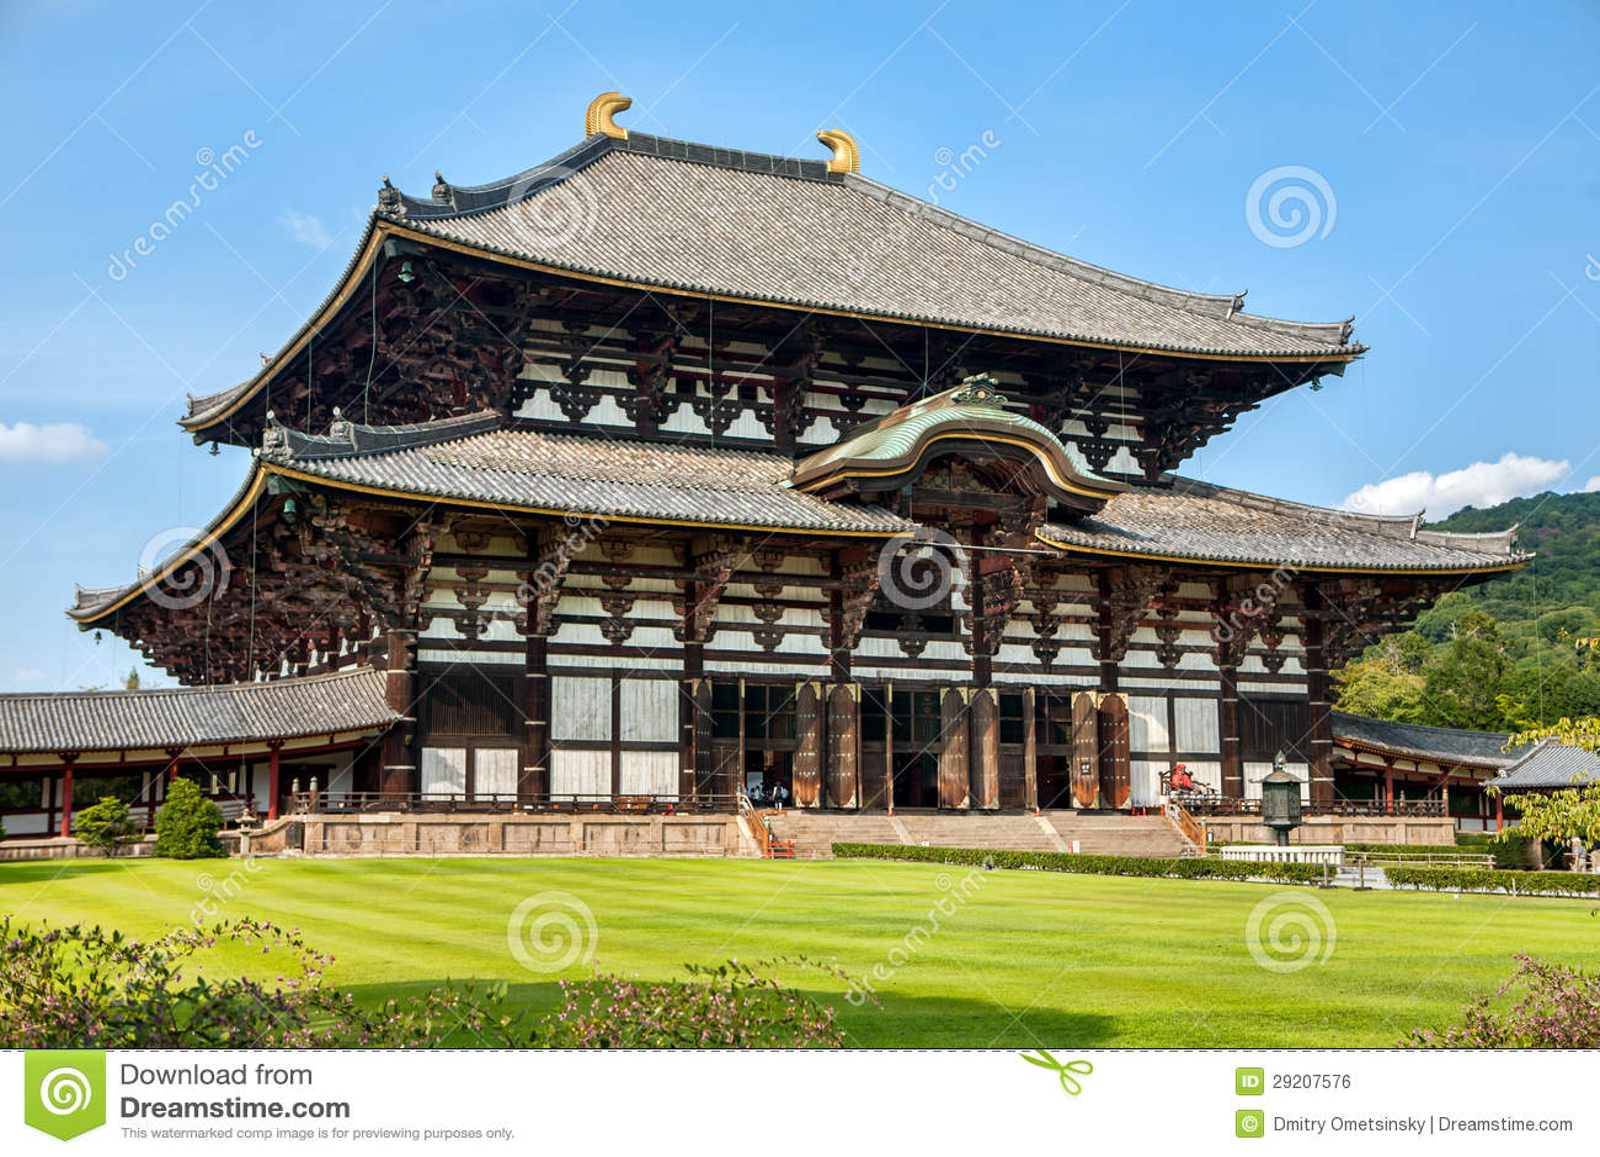 Todaiji Temple In Nara Royalty Free Stock Image - Image: 29207576